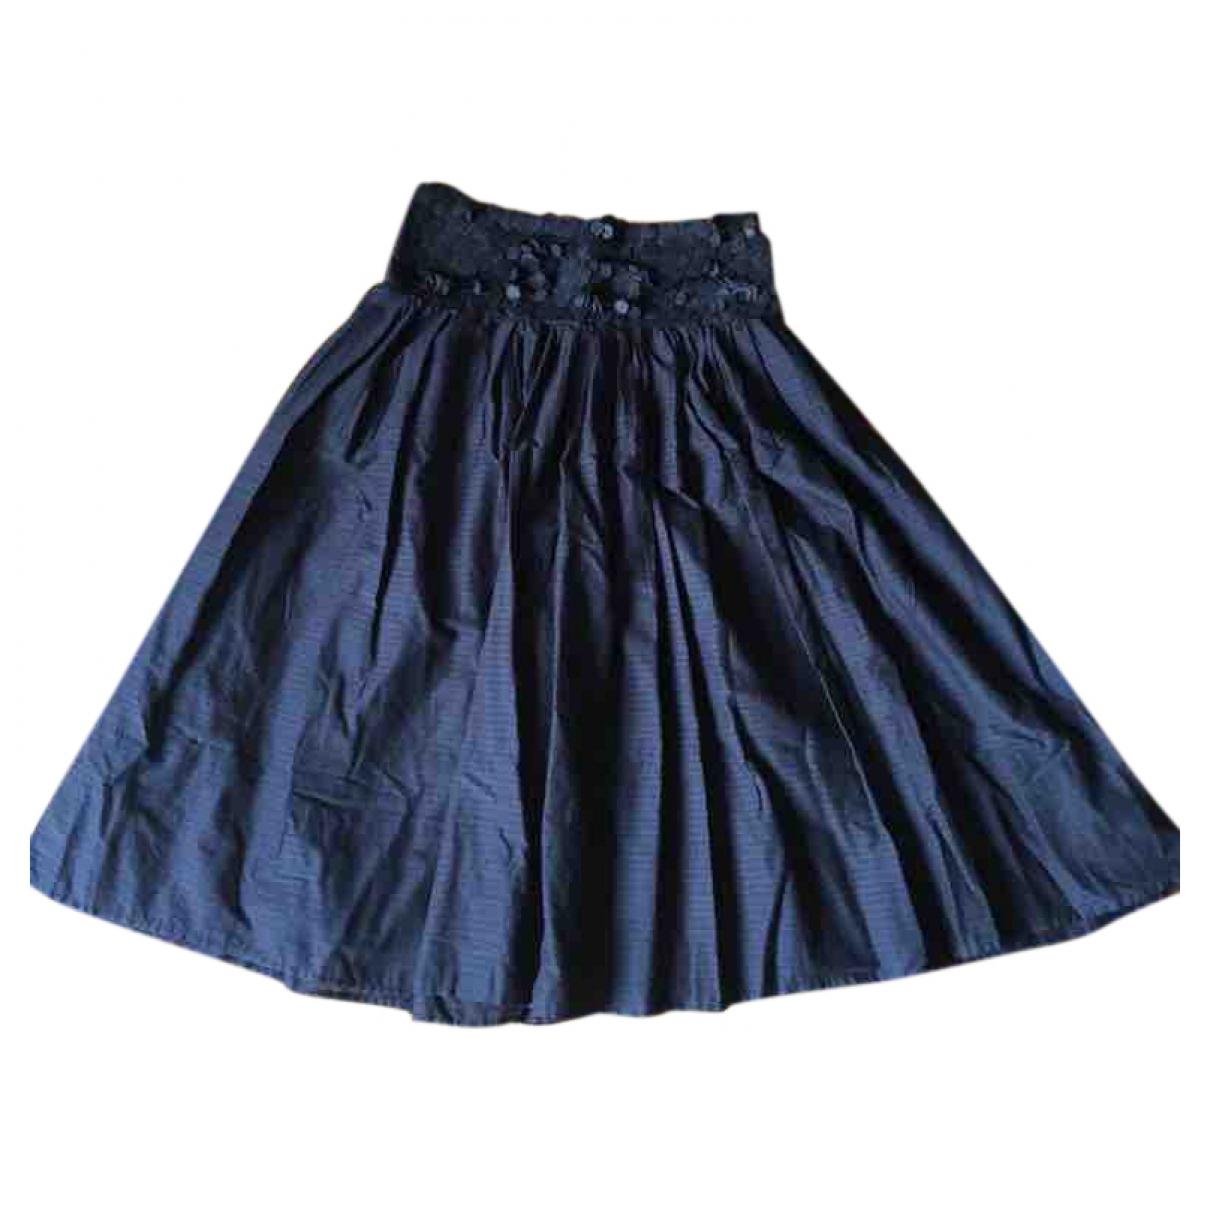 Zara \N Brown Cotton skirt for Women S International